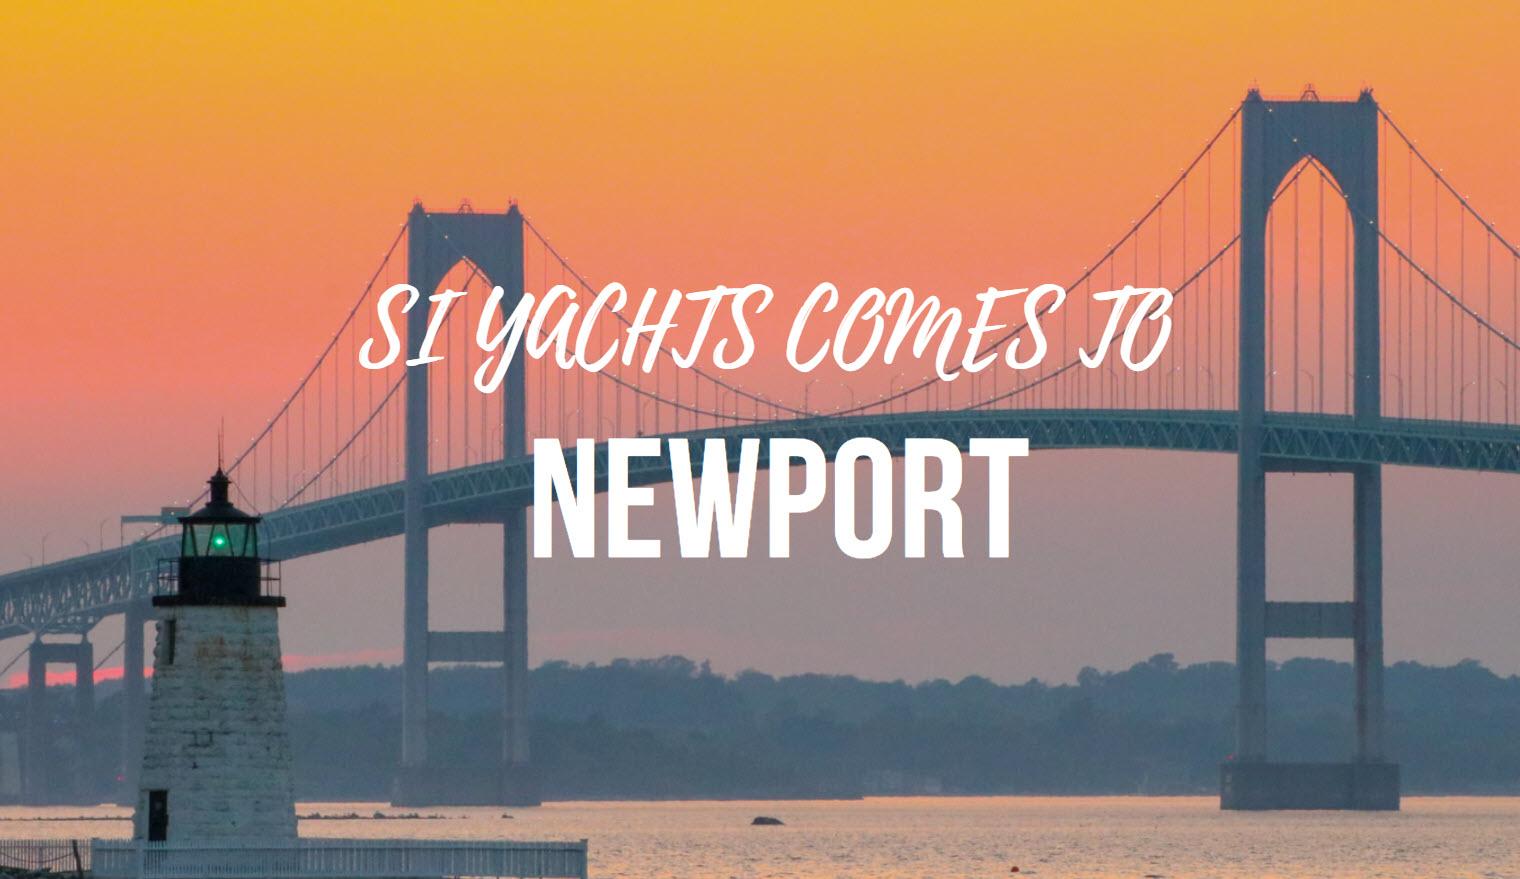 yachts for sale in newport rhode island